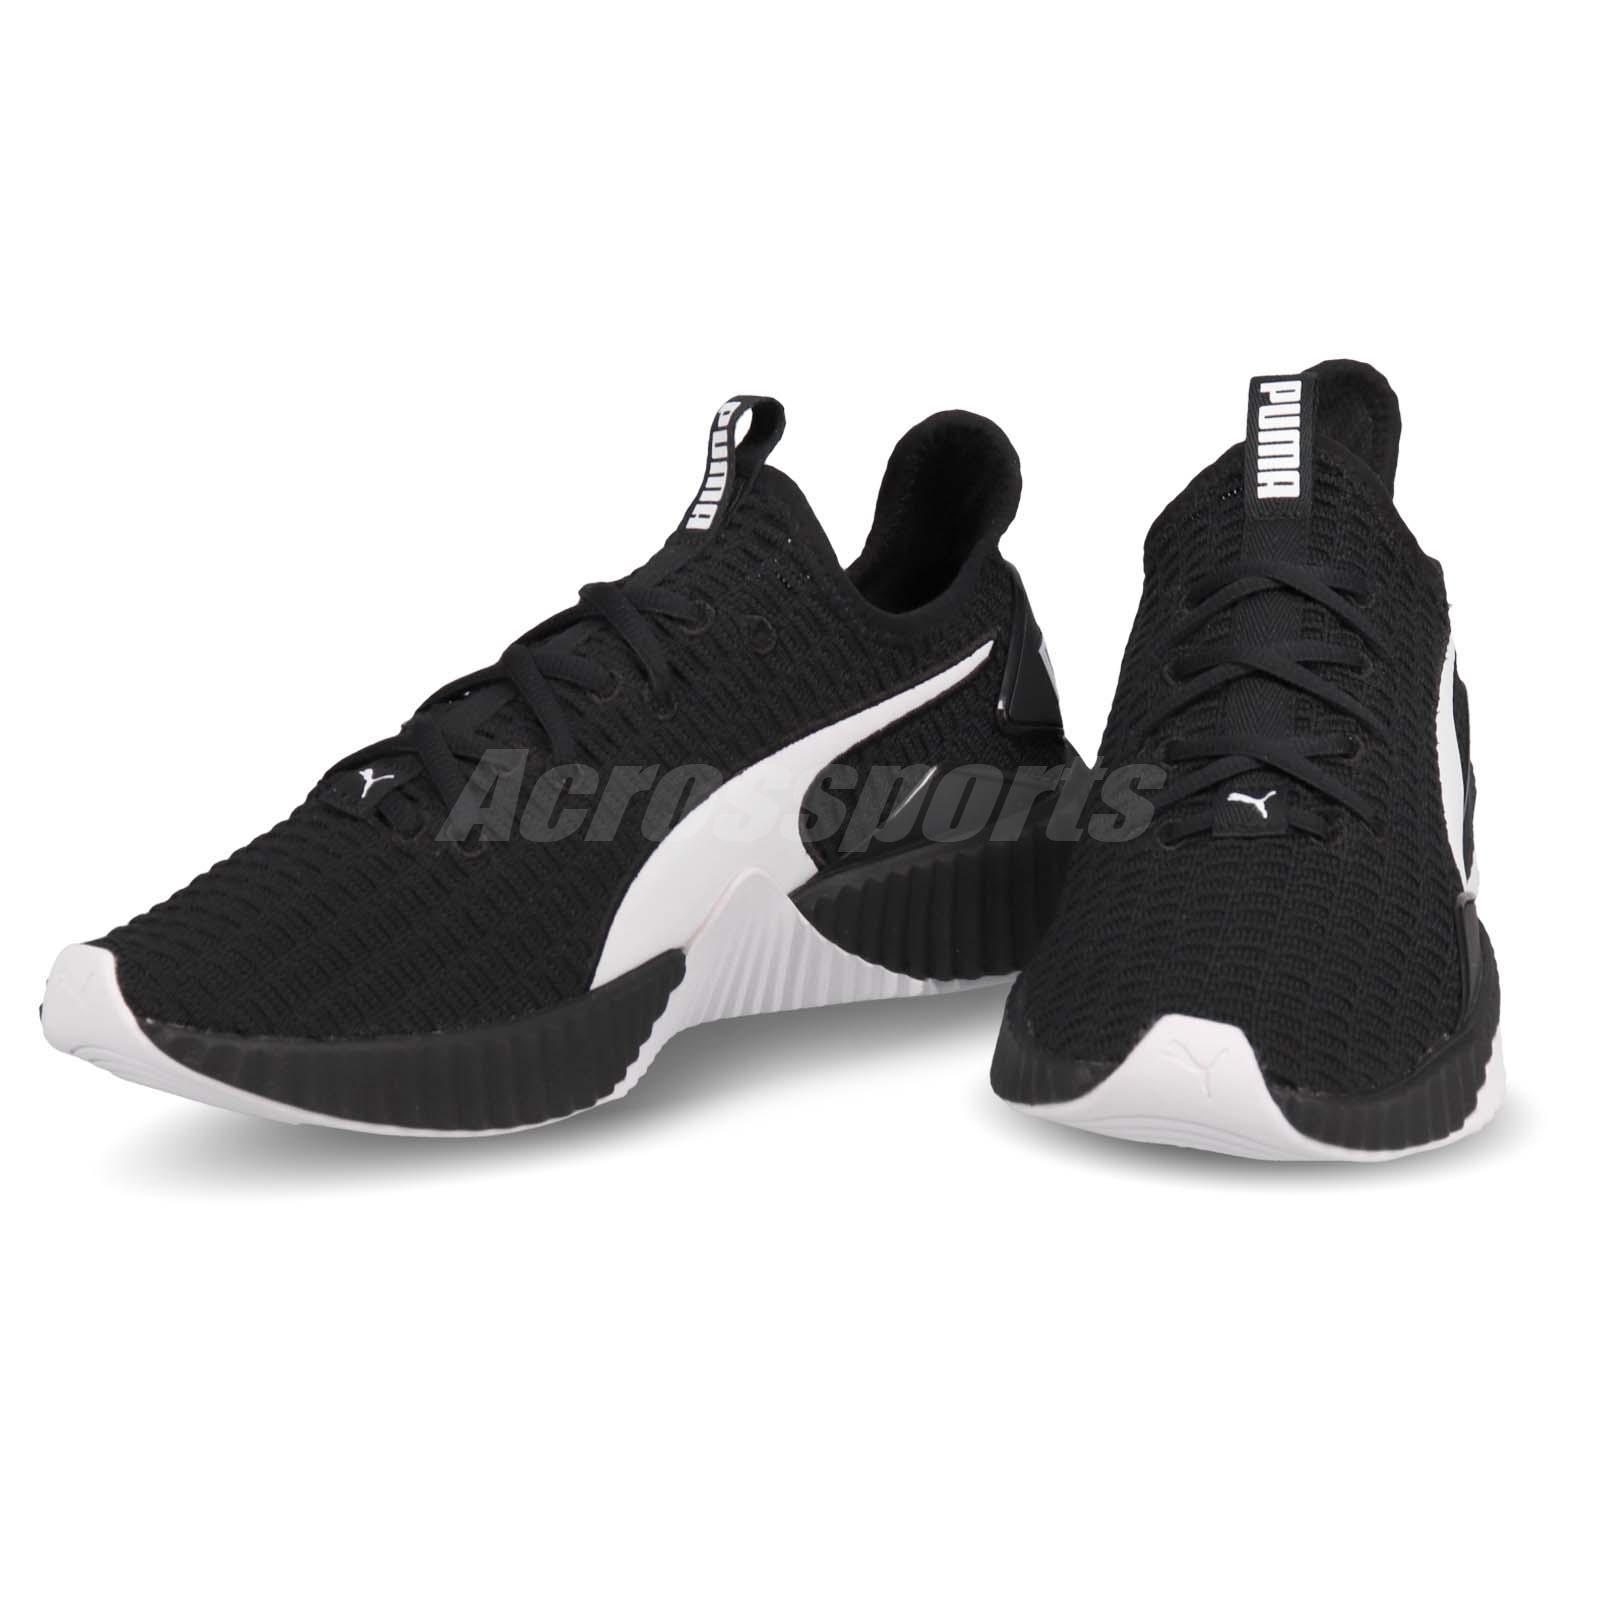 Détails sur Puma Defy Wns Black White Women Running Training Casual Shoes Sneakers 190949 12